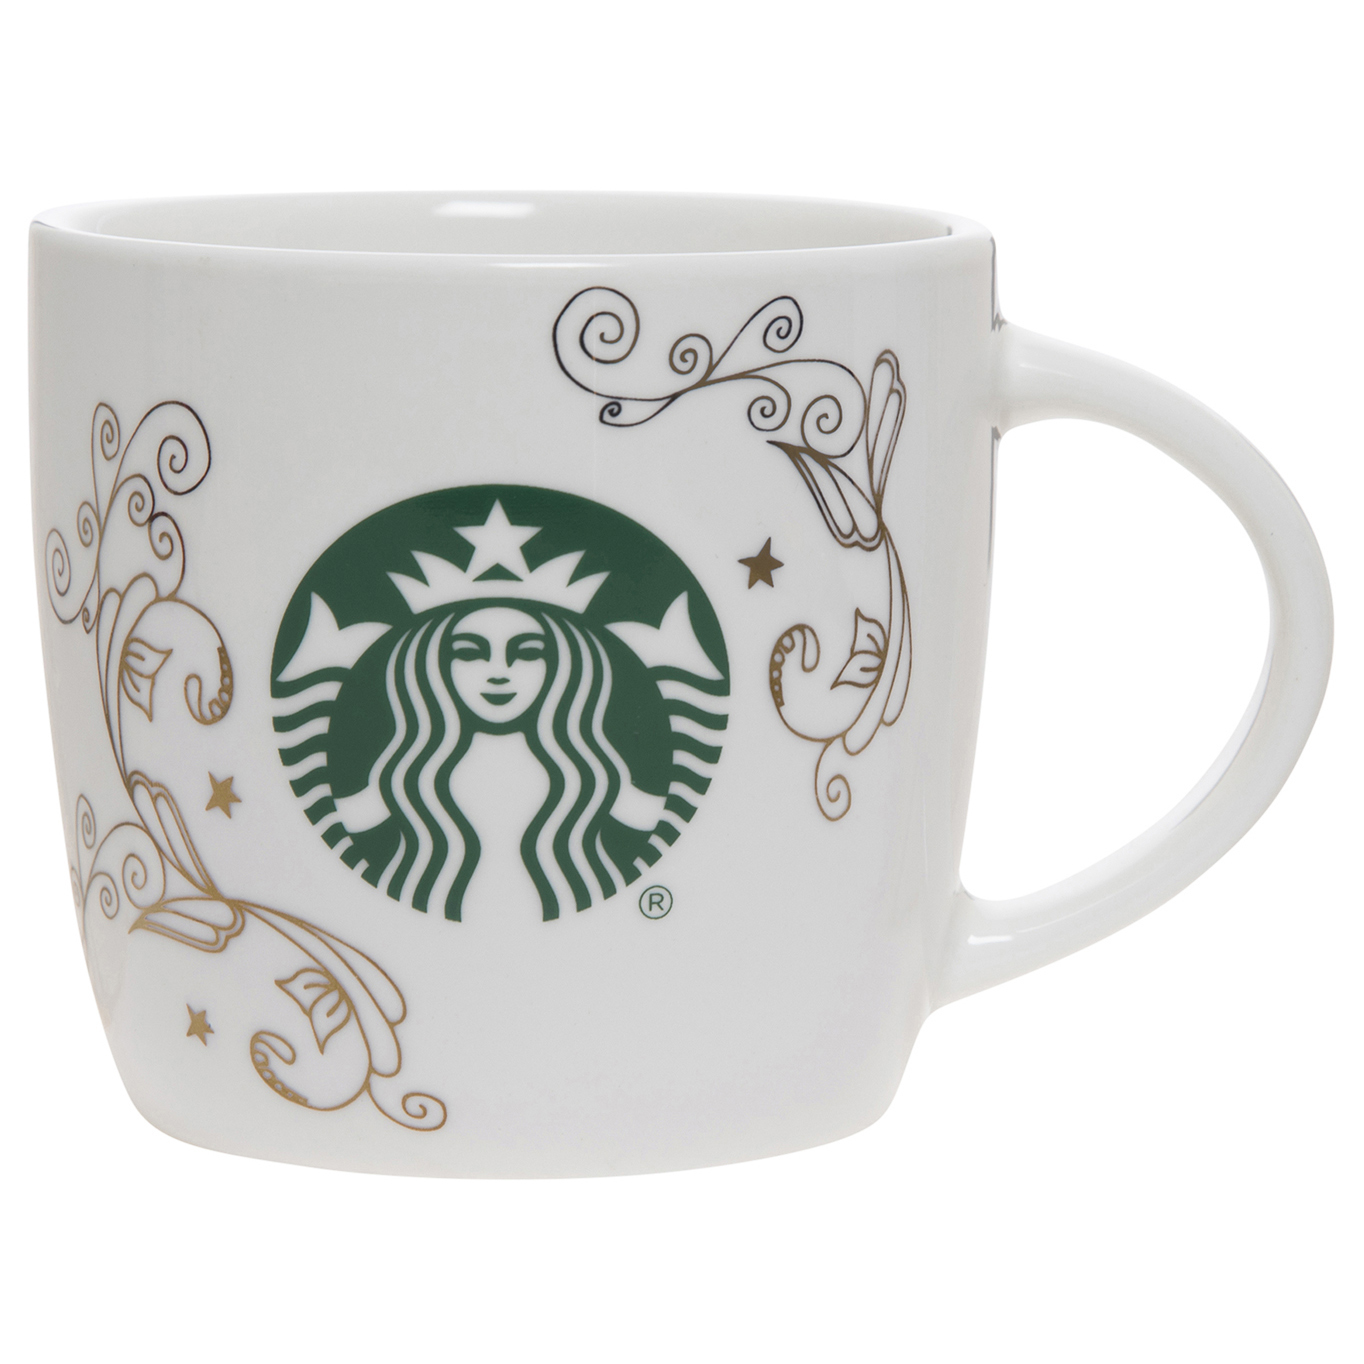 Starbucks 14oz Ceramic Mug White Swirl